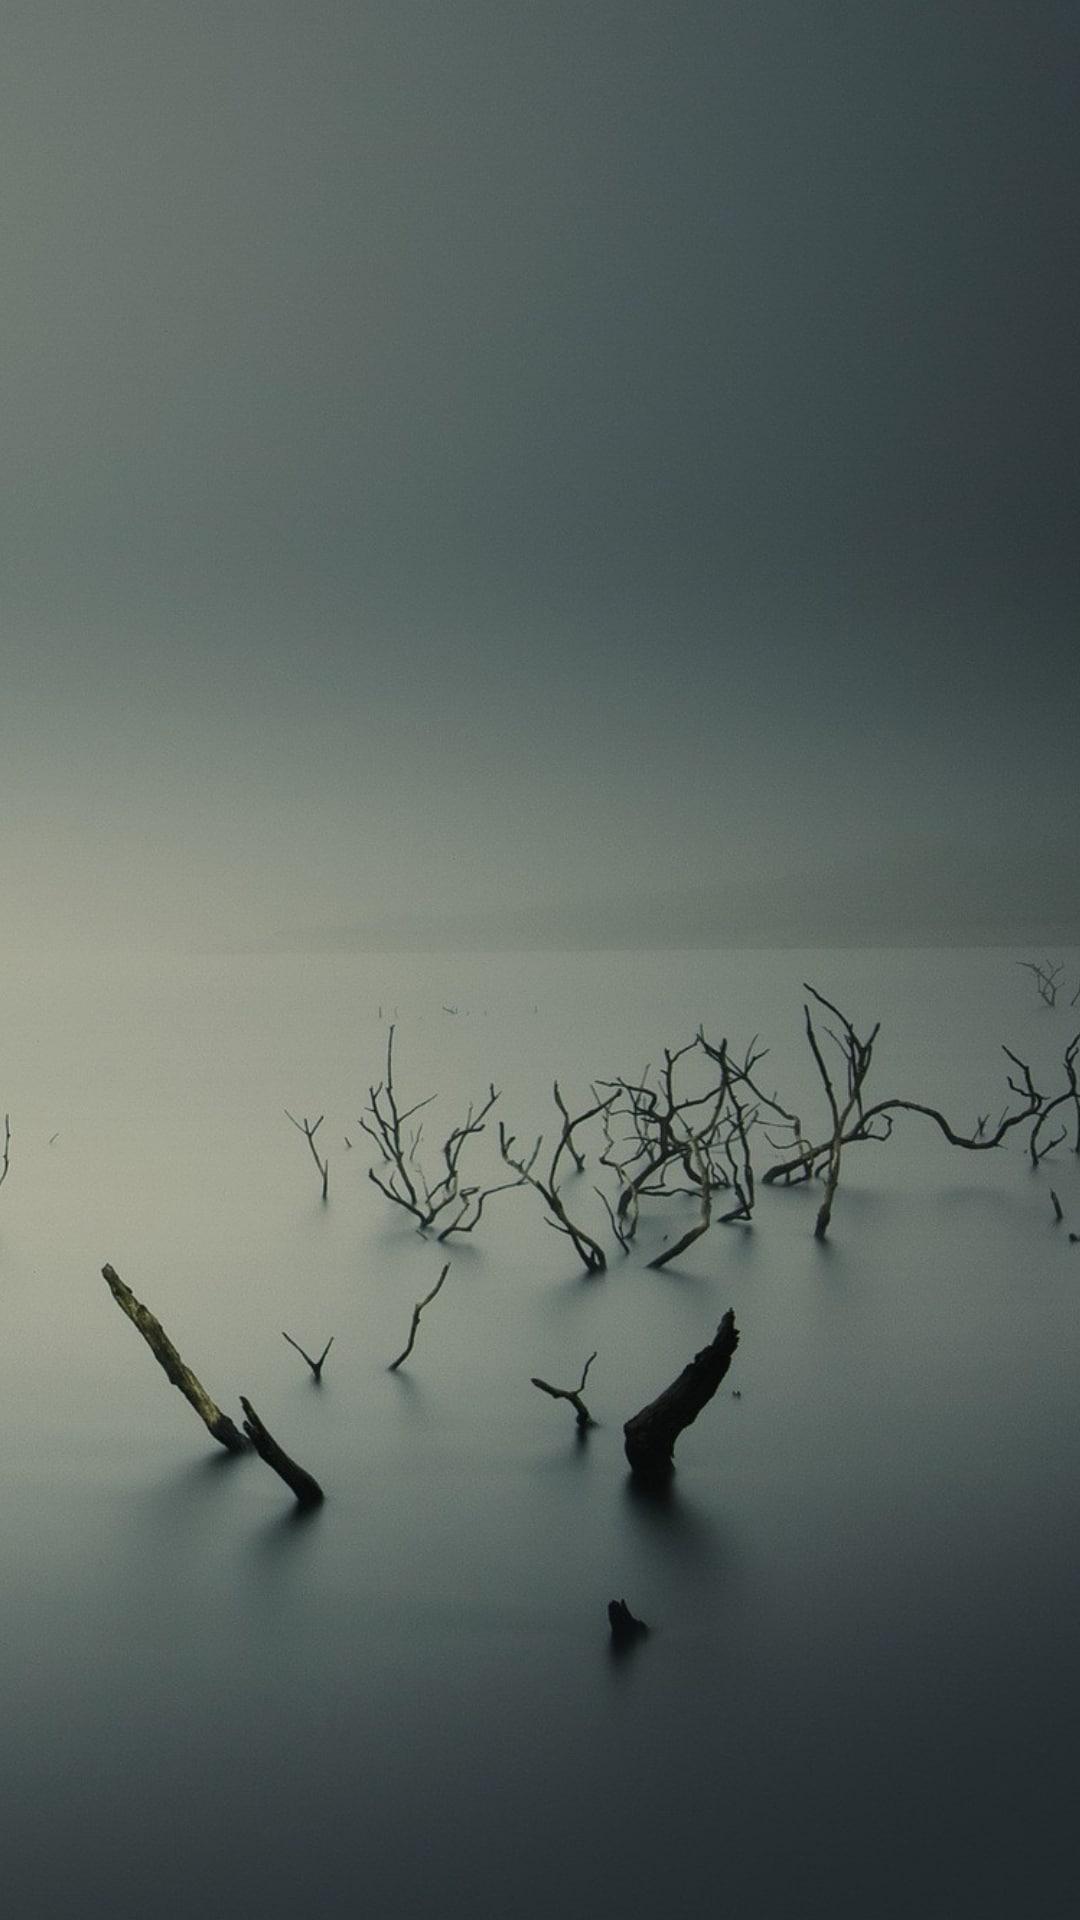 Awallpapers 9 bellissimi sfondi di paesaggi con la nebbia for Sfondi paesaggi bellissimi